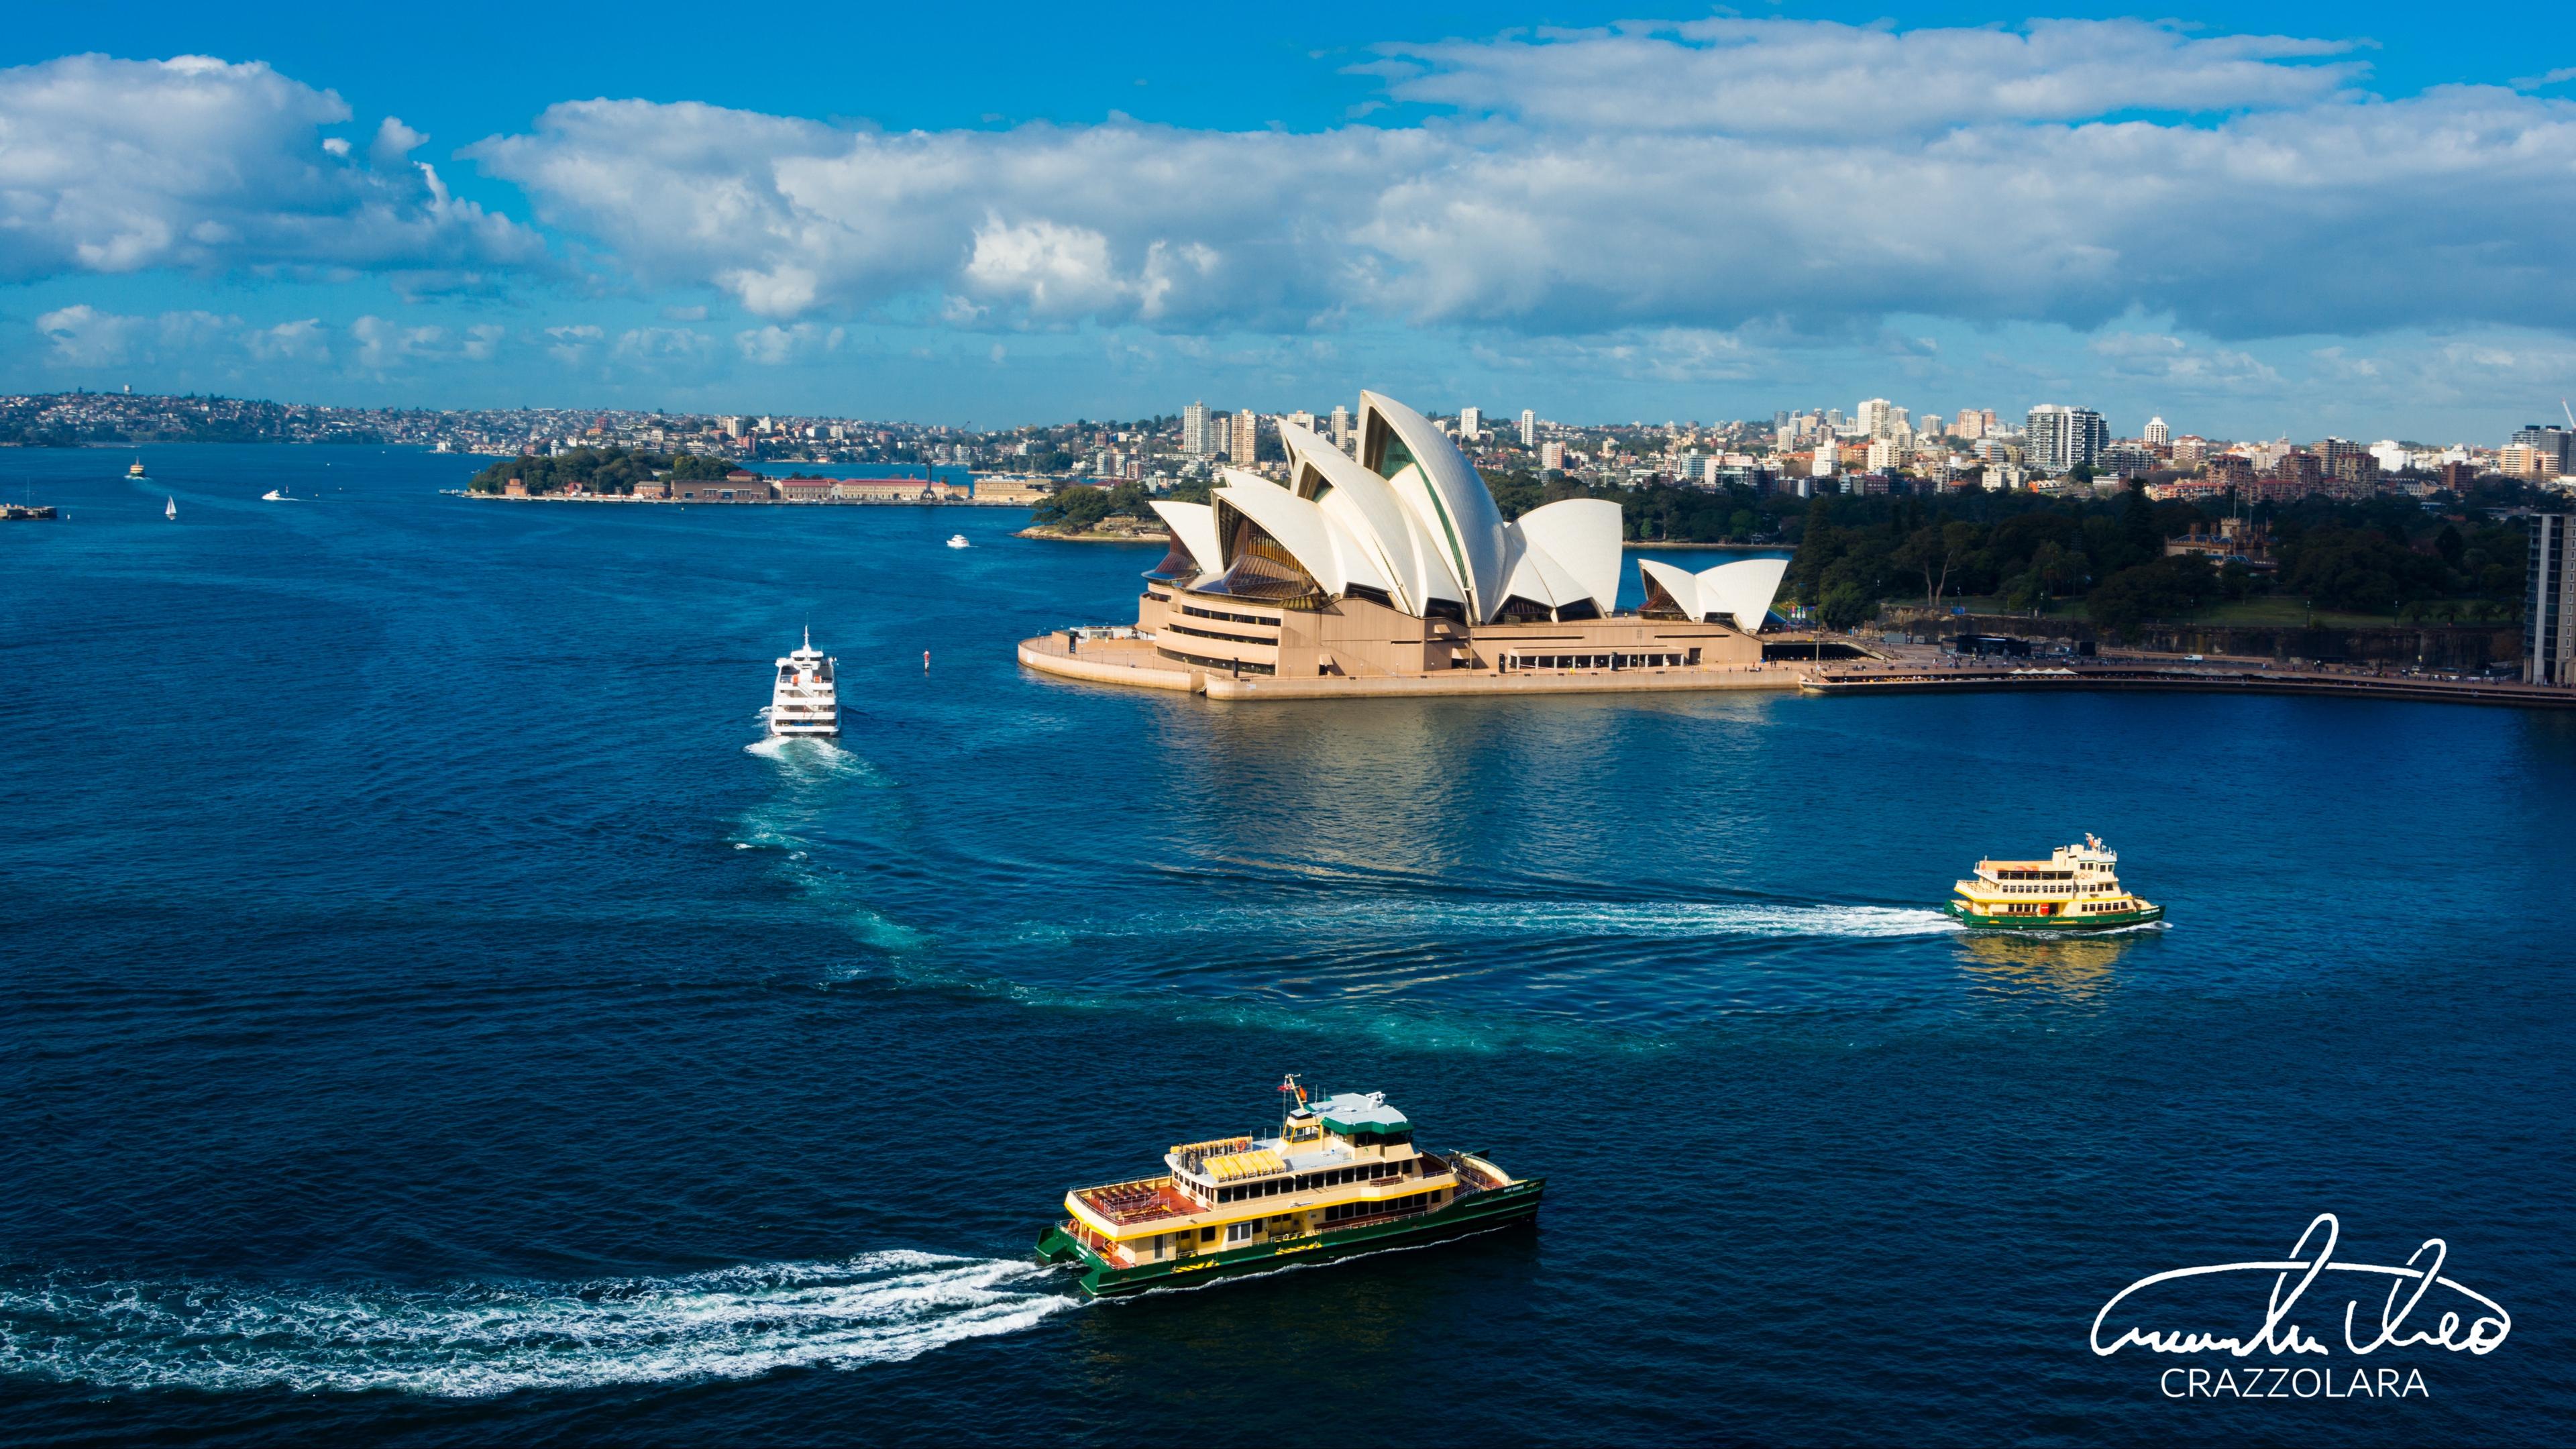 sydney opera house theater harbor ships sydney australia 4k 1538066110 - sydney opera house, theater, harbor, ships, sydney, australia 4k - theater, sydney opera house, Harbor